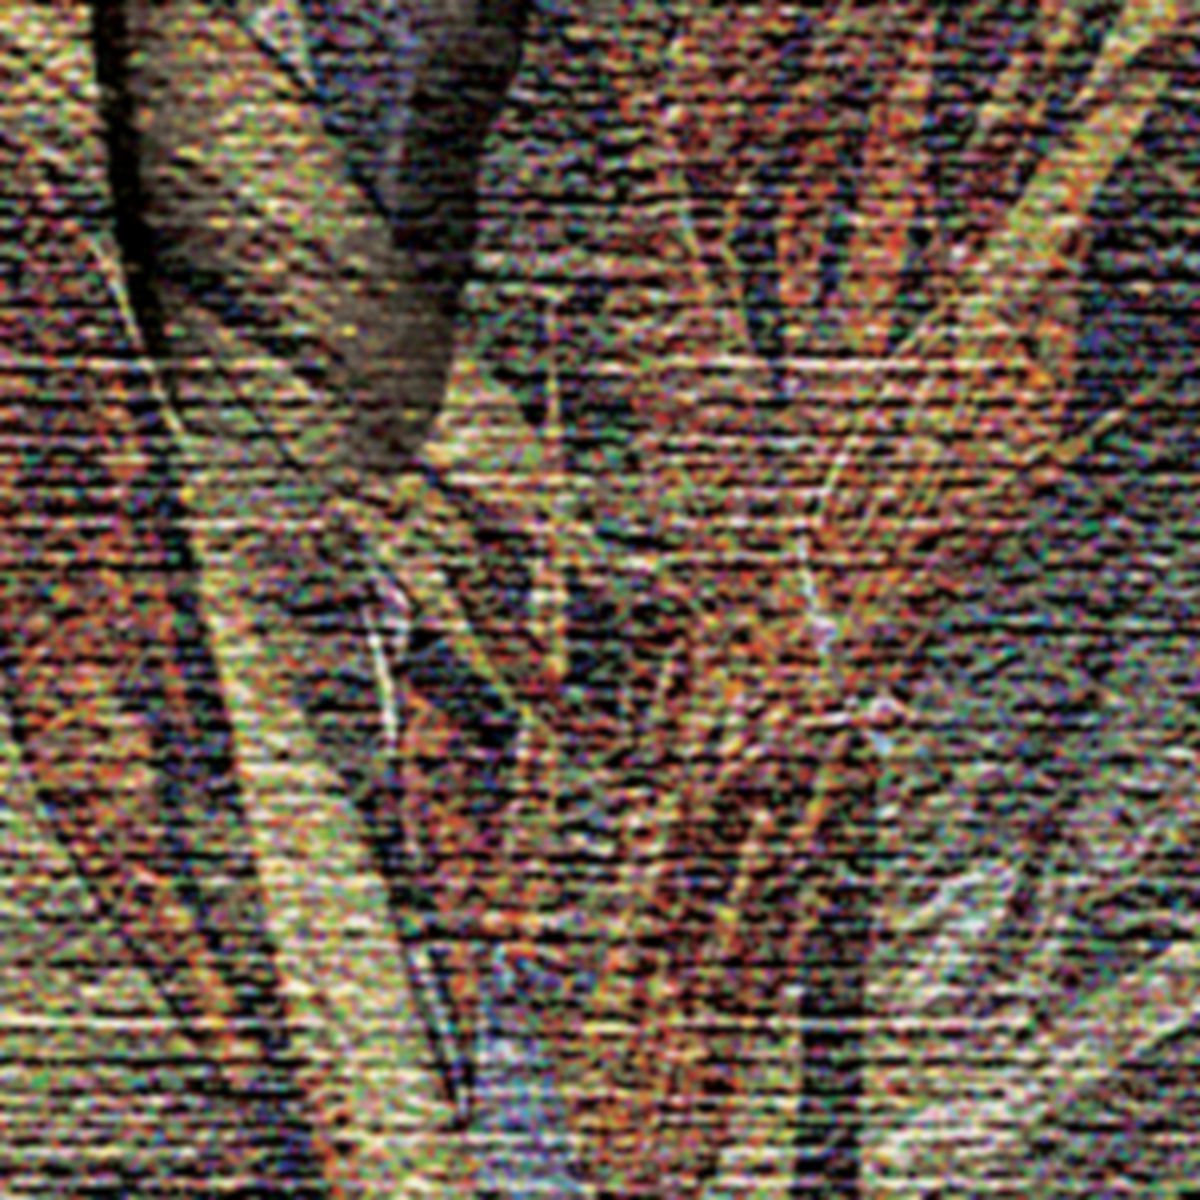 Cabela's Die-Cut 3-D Leafy Material